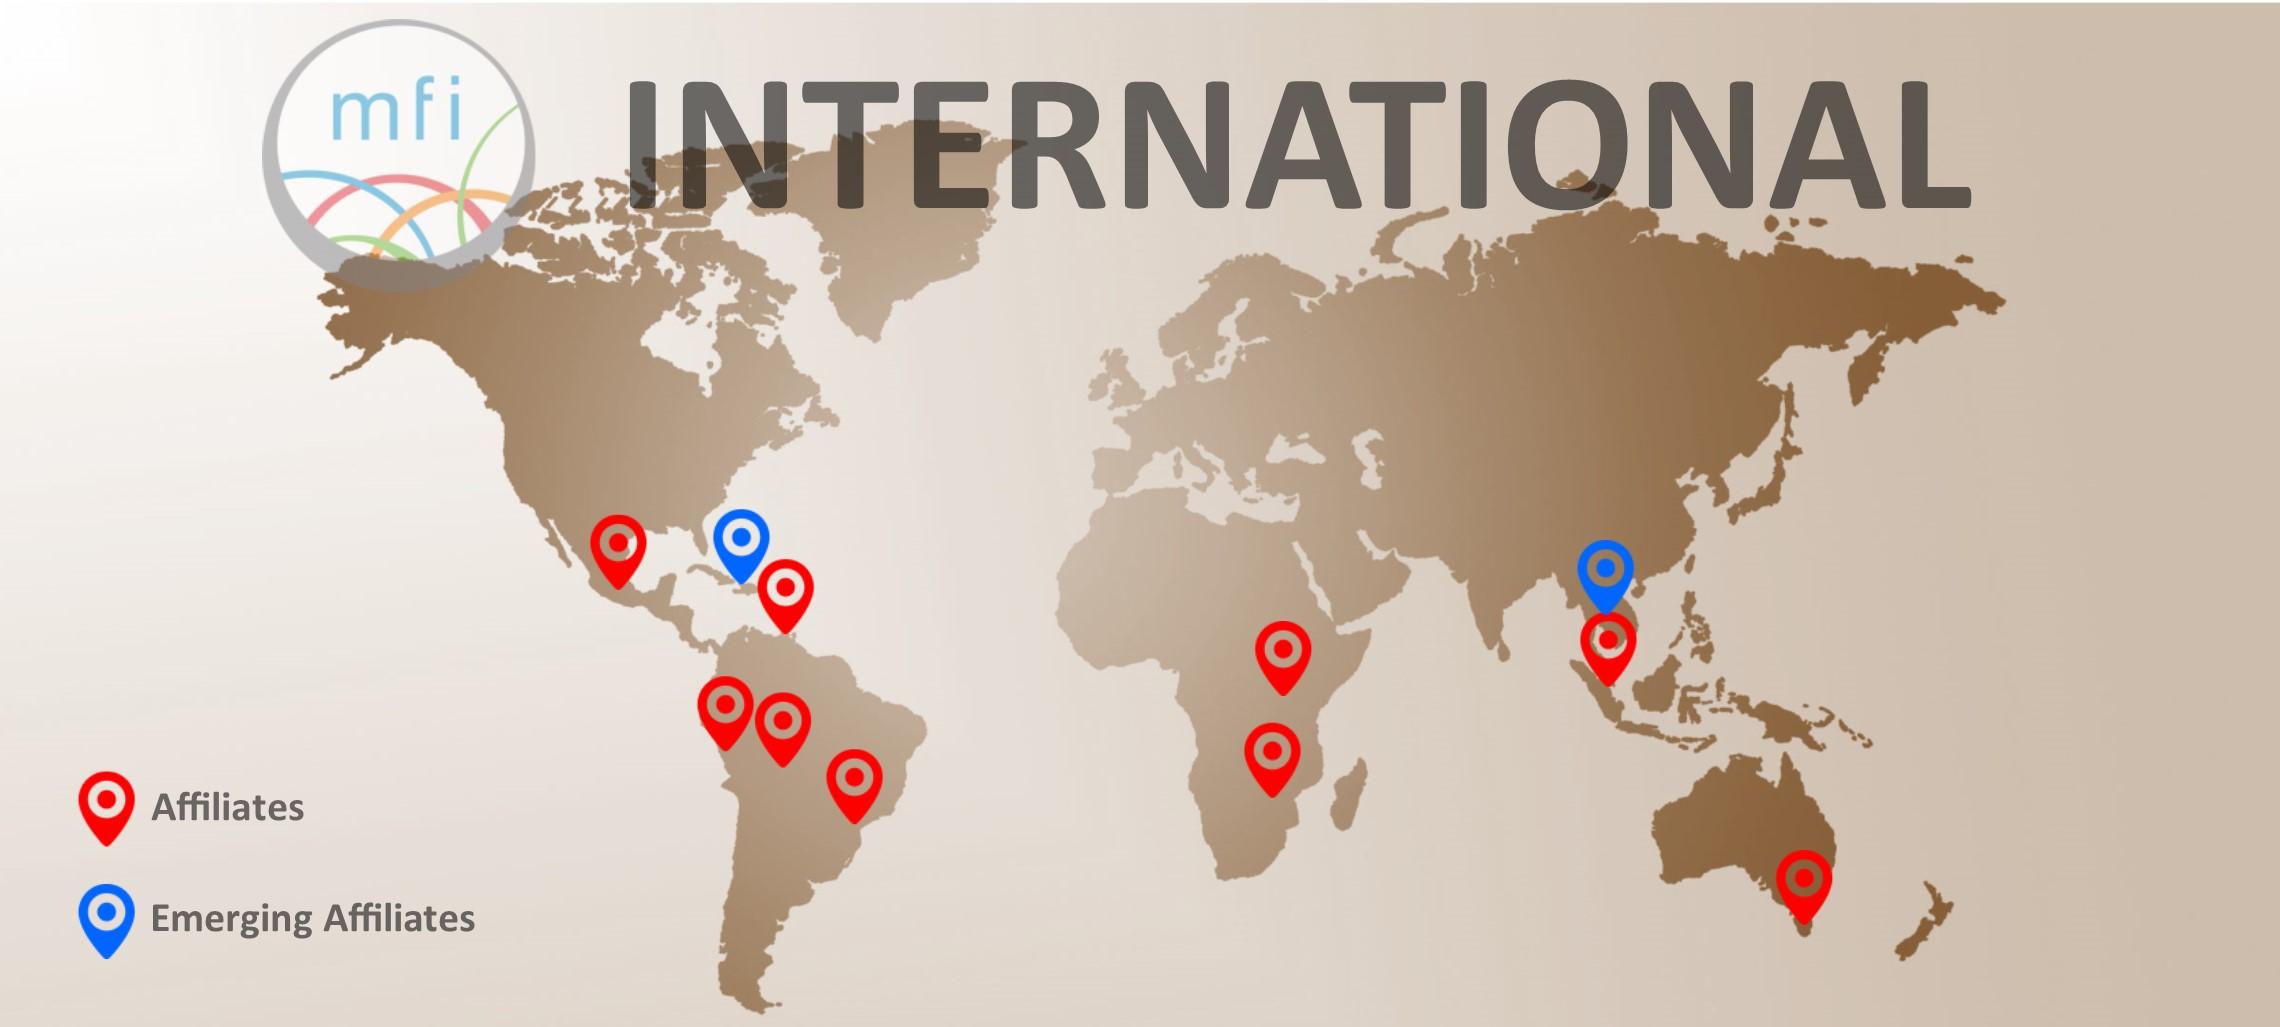 mfi-intl-map.jpg